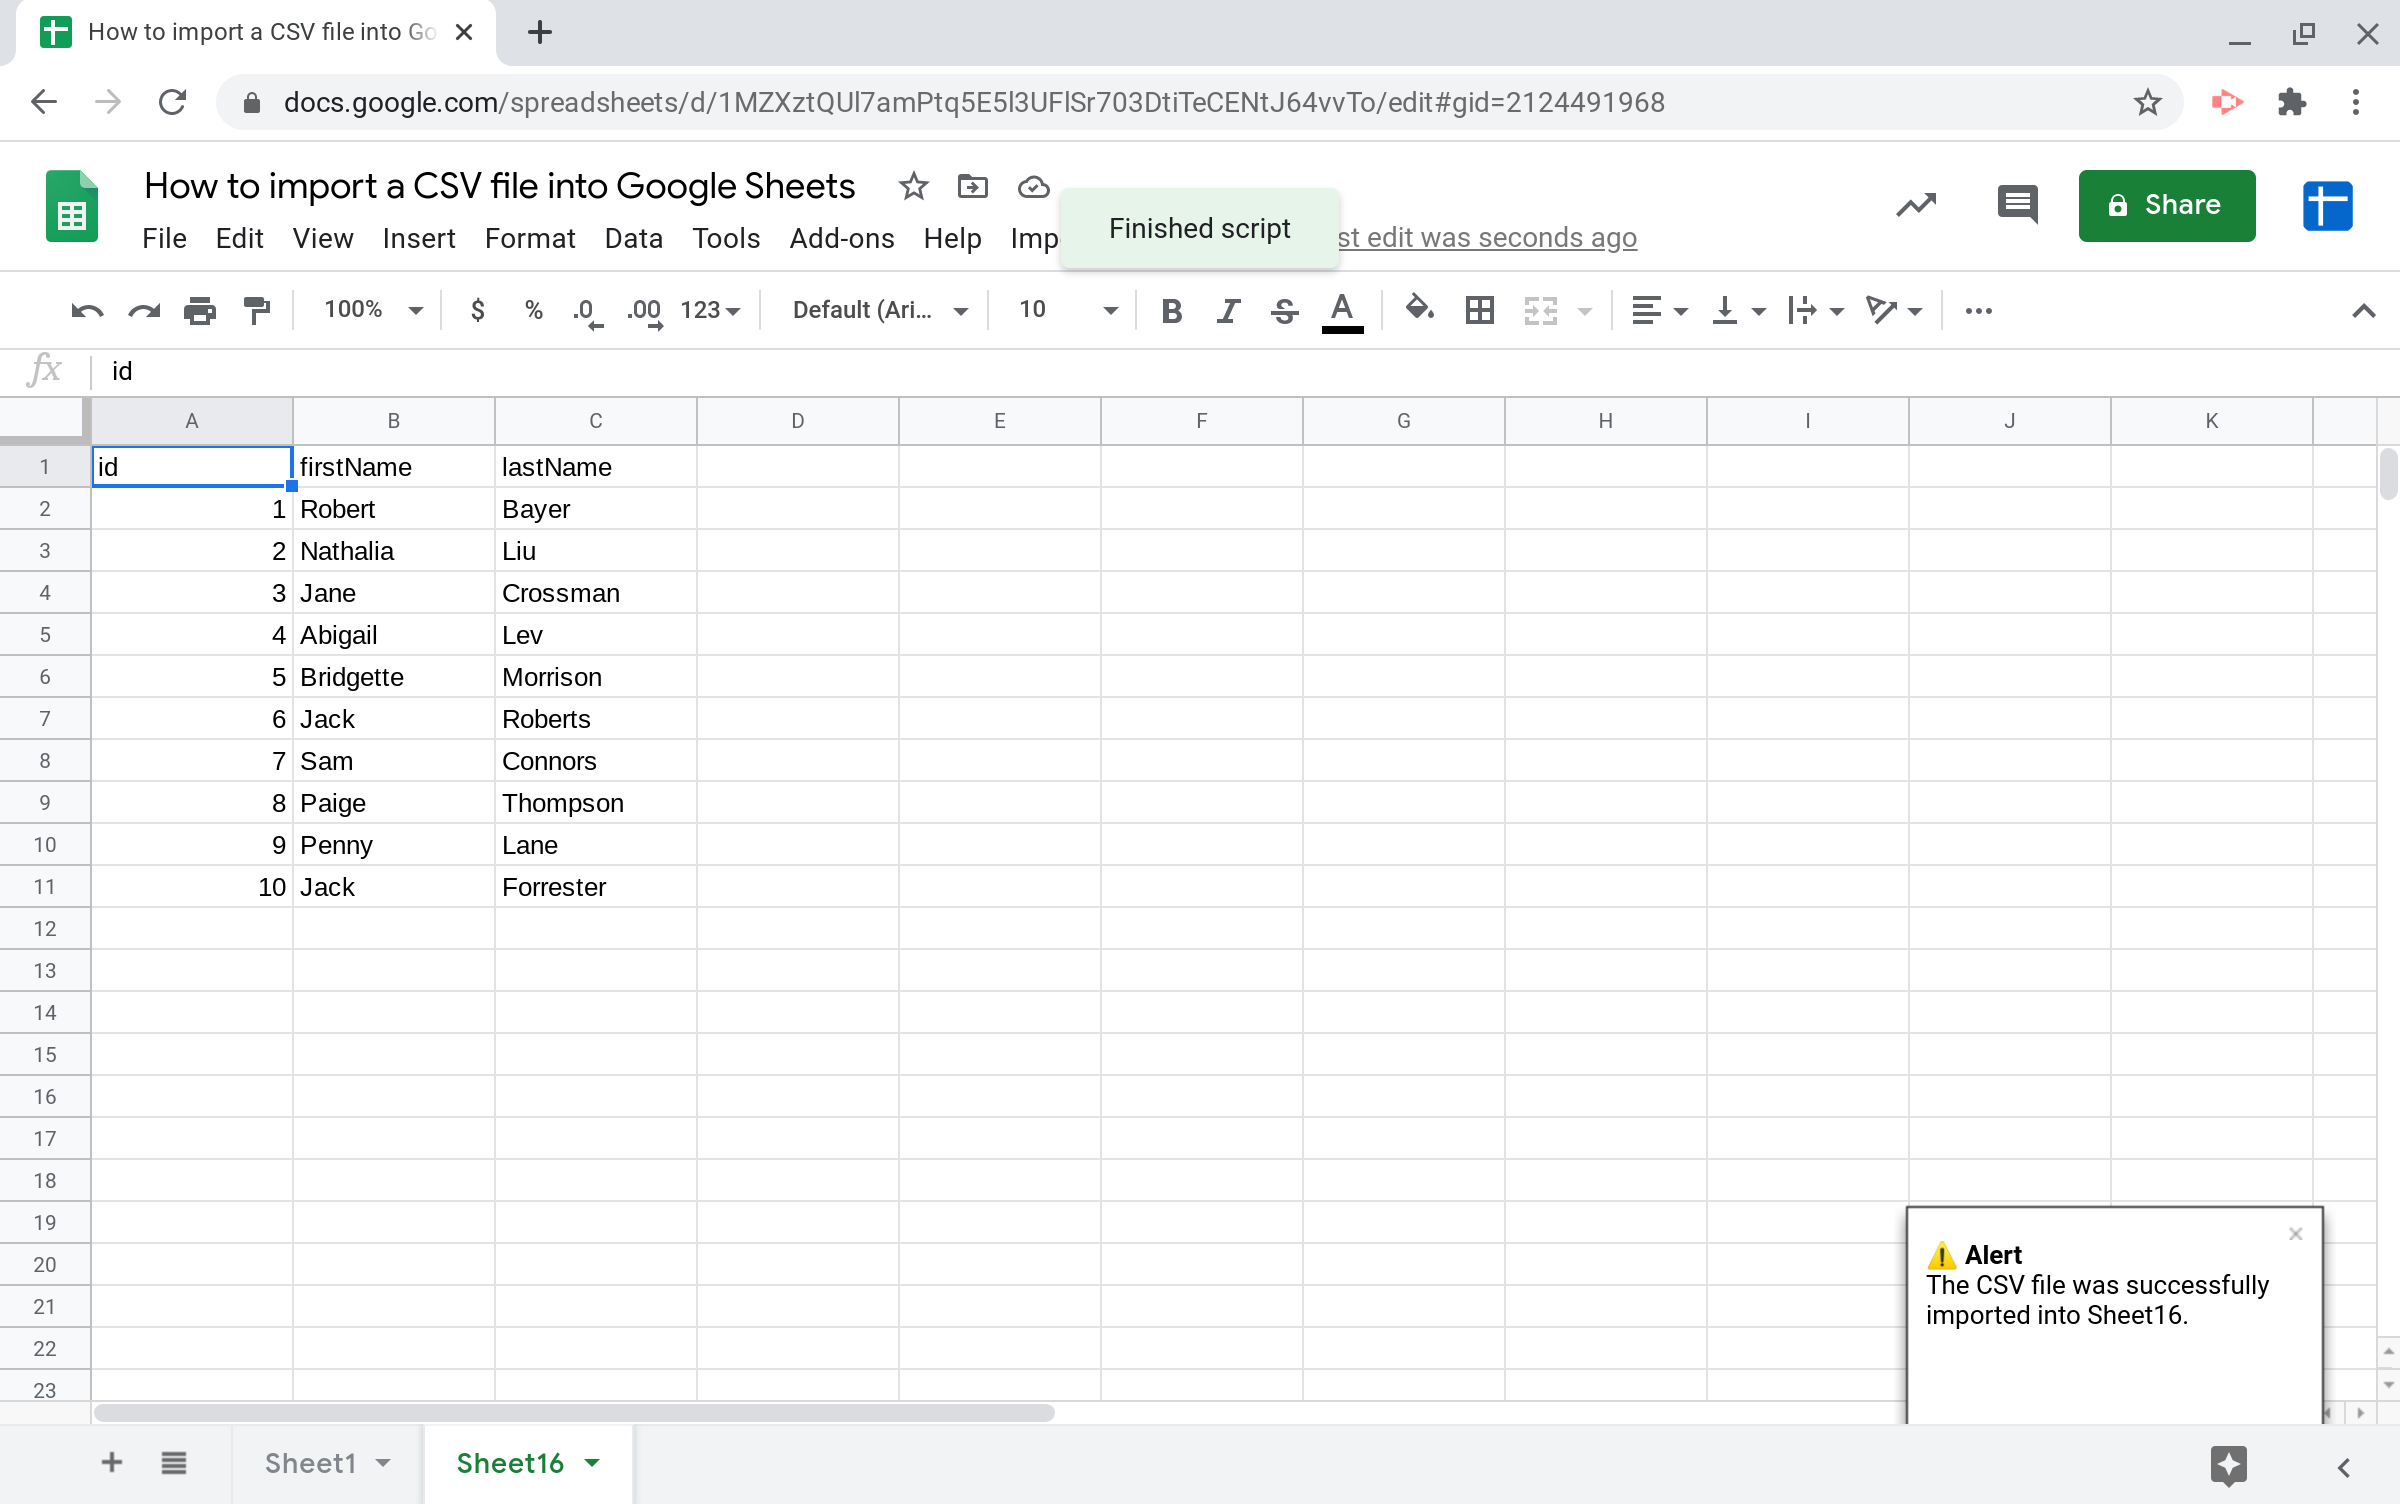 Screenshot of the sheet where the CSV file